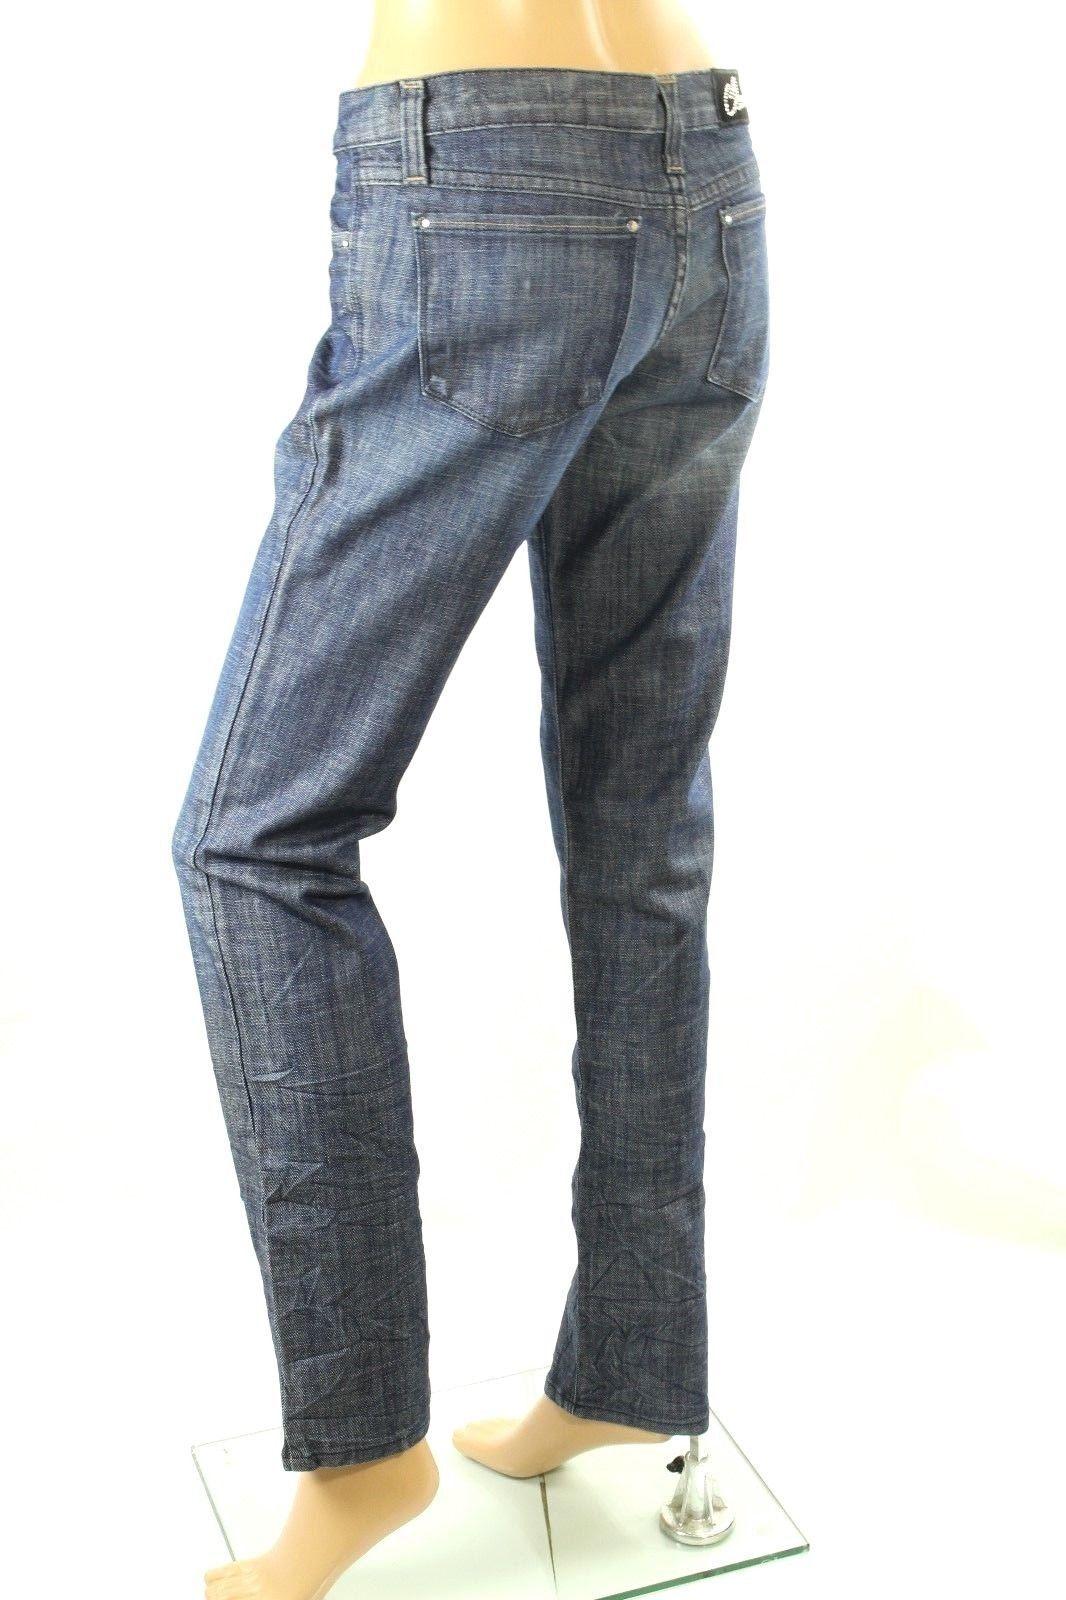 Claudio Milano Damen Jeans Jeans Jeans Kristall Verziert Gr. 13 Einzelhandel 1d65d8